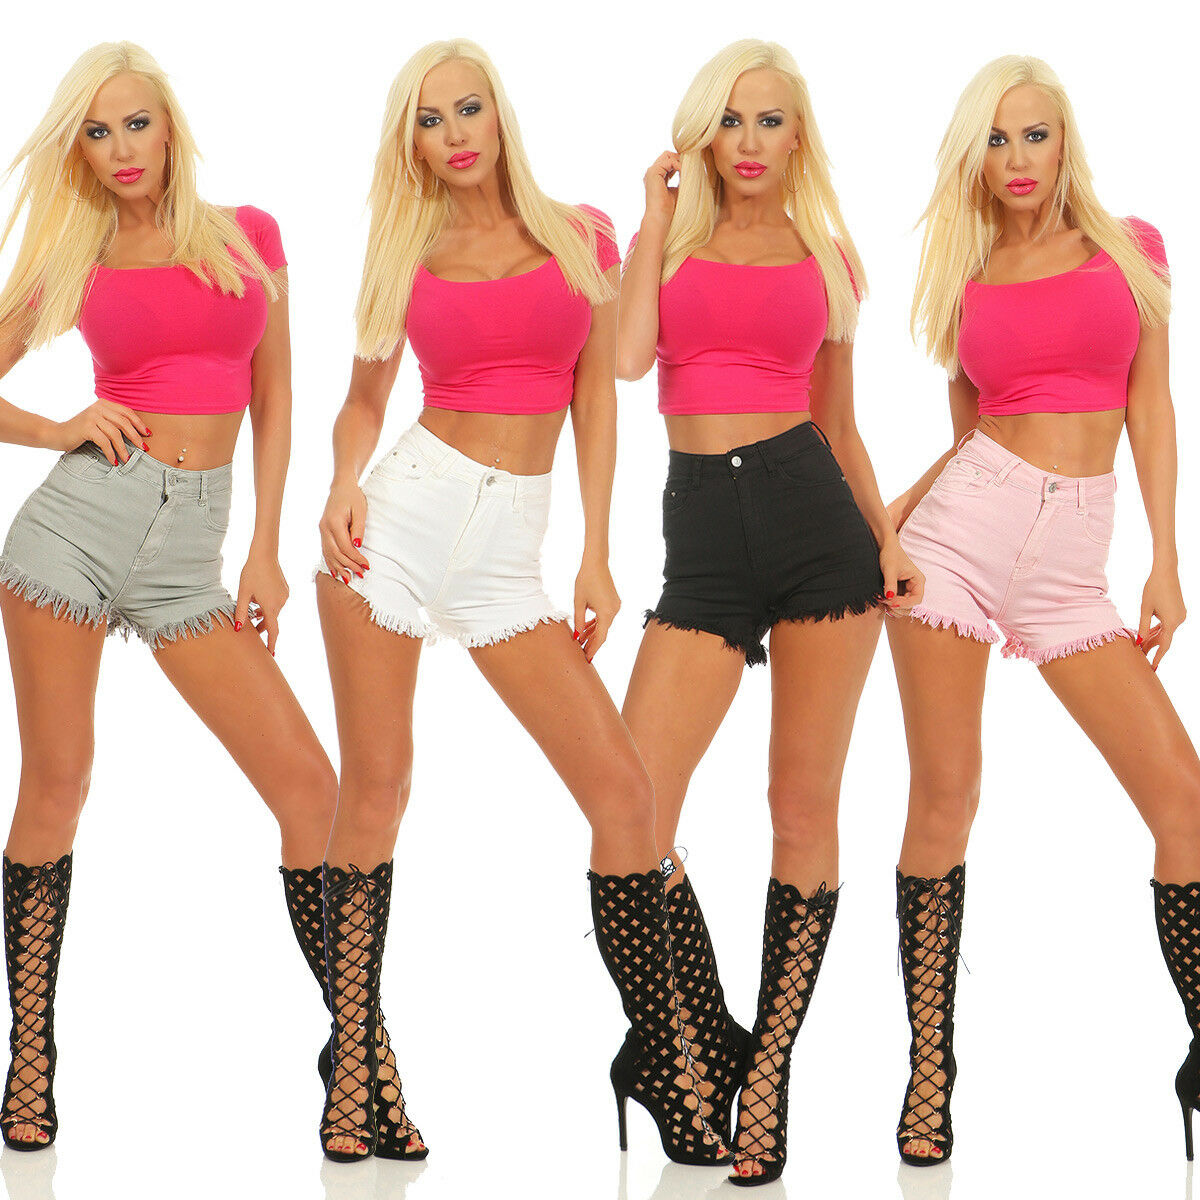 33988 Damen Jeans Hotpants Denim Shorts kurze Hose Hot Pants Jeans High-Waist